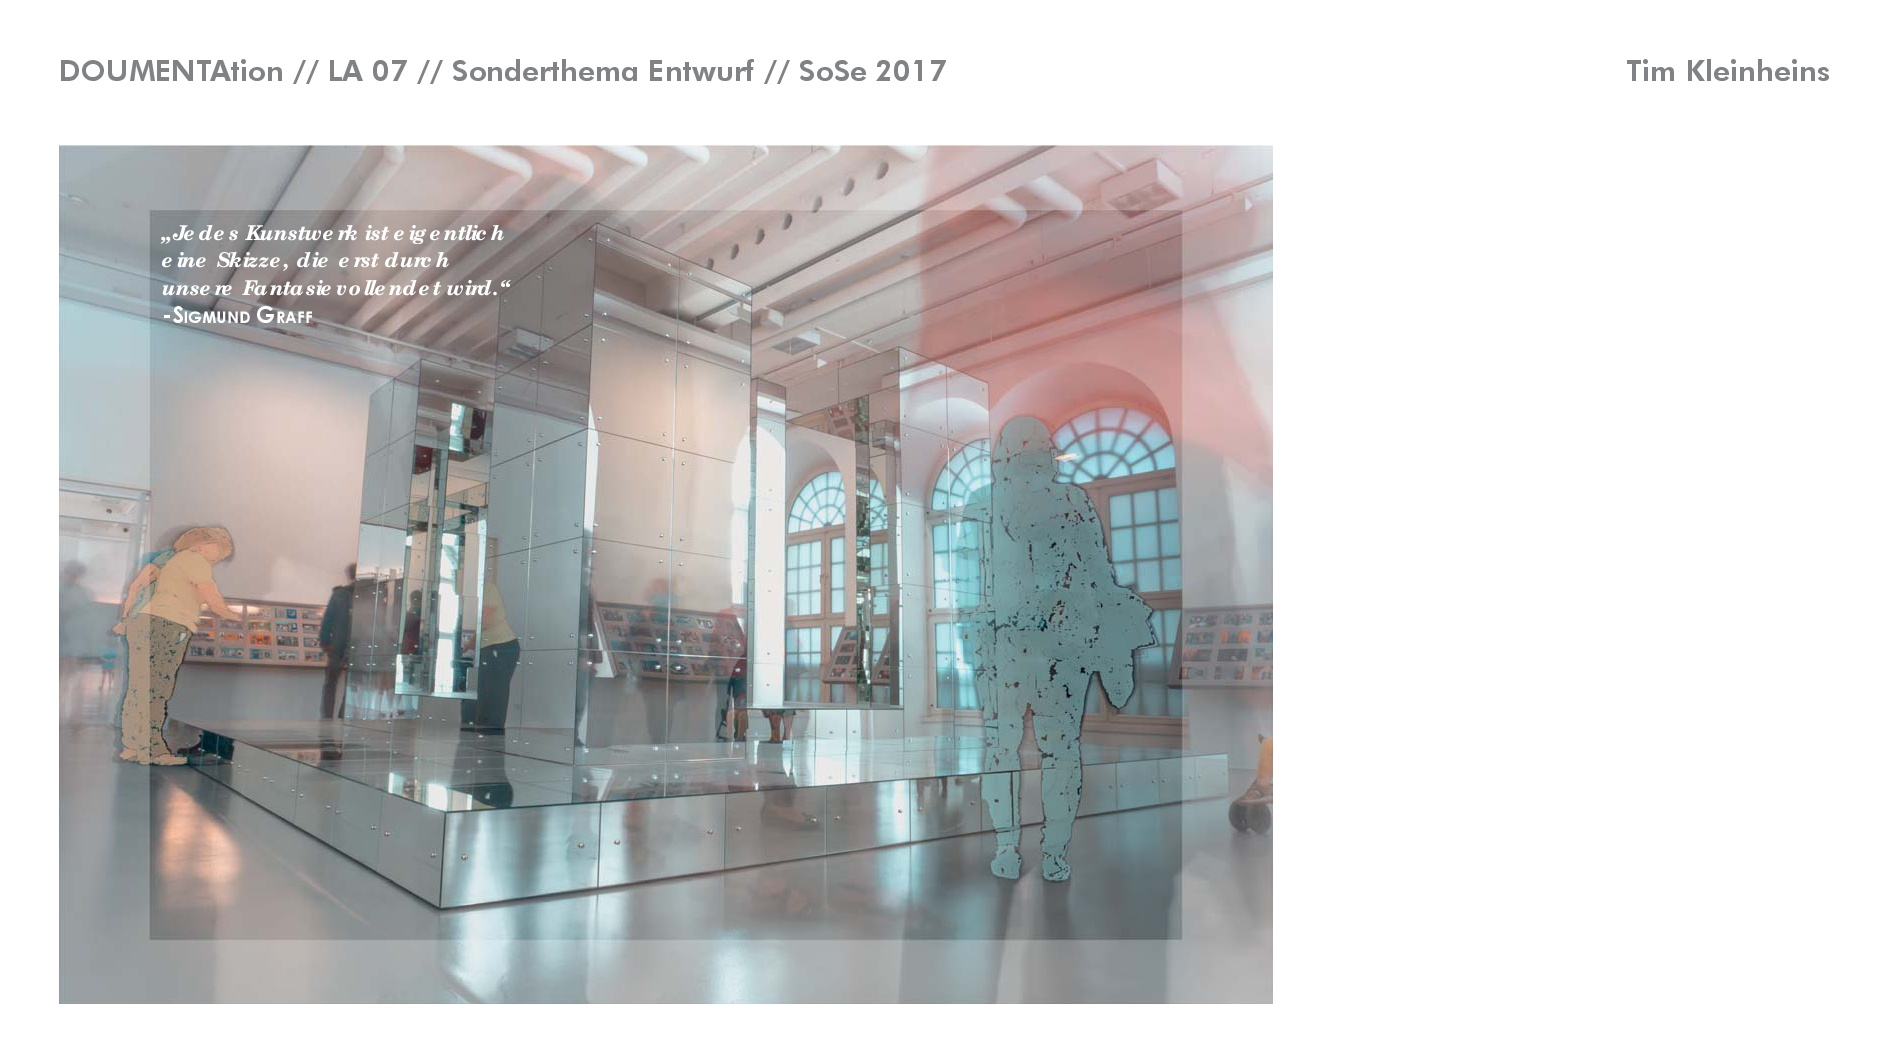 NEU Sonderthema Entwerfen SoSe 17 008